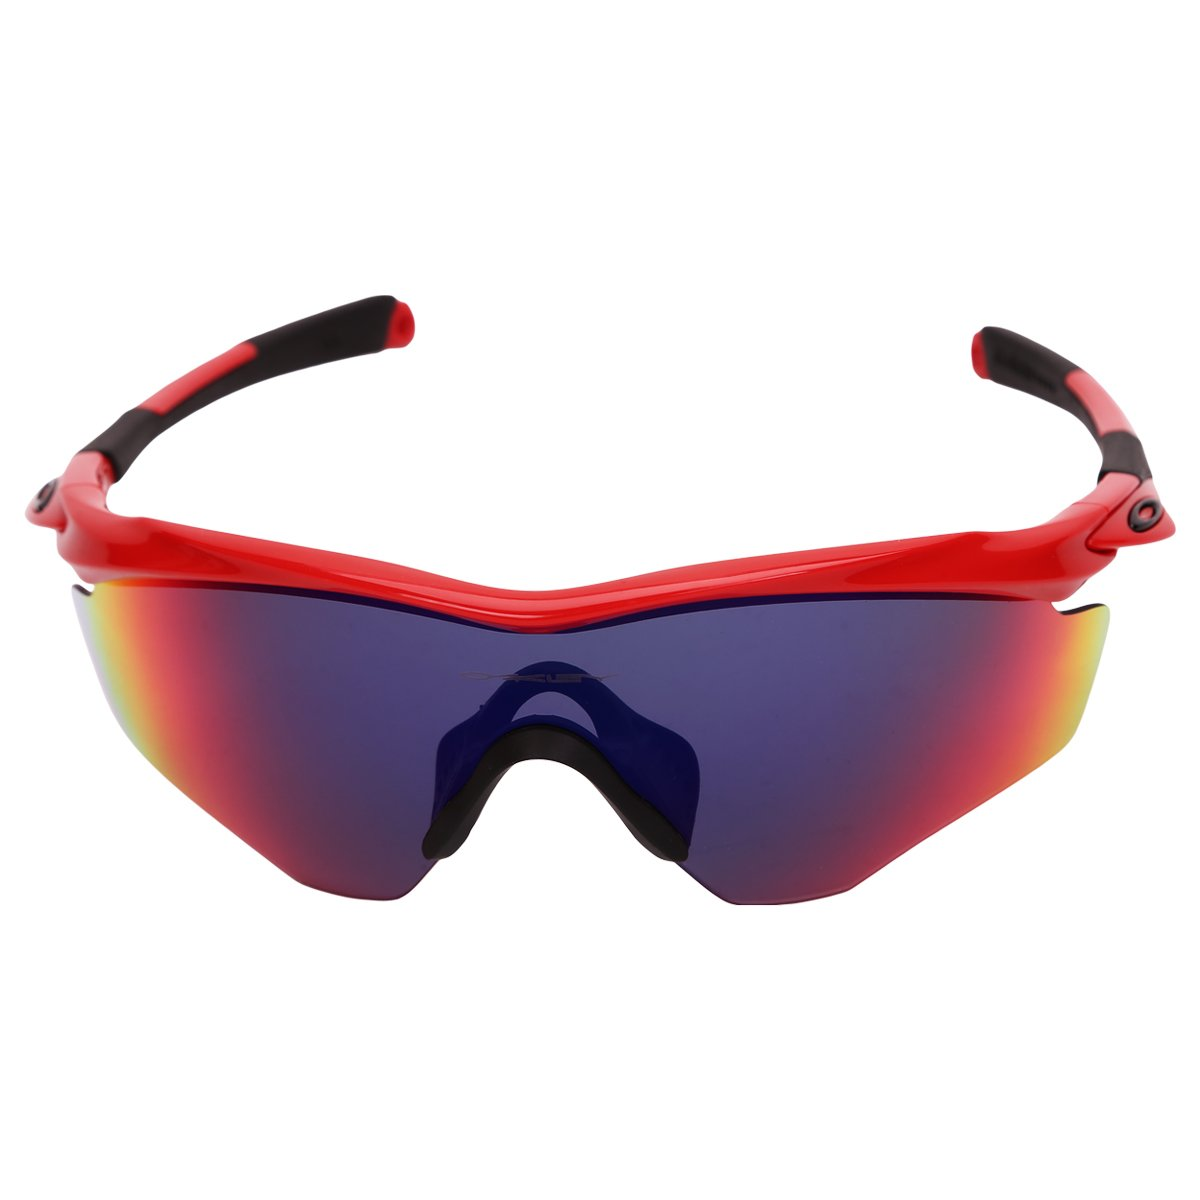 151a2bf7a6529 Óculos Oakley M2 Frame XL - Compre Agora   Netshoes